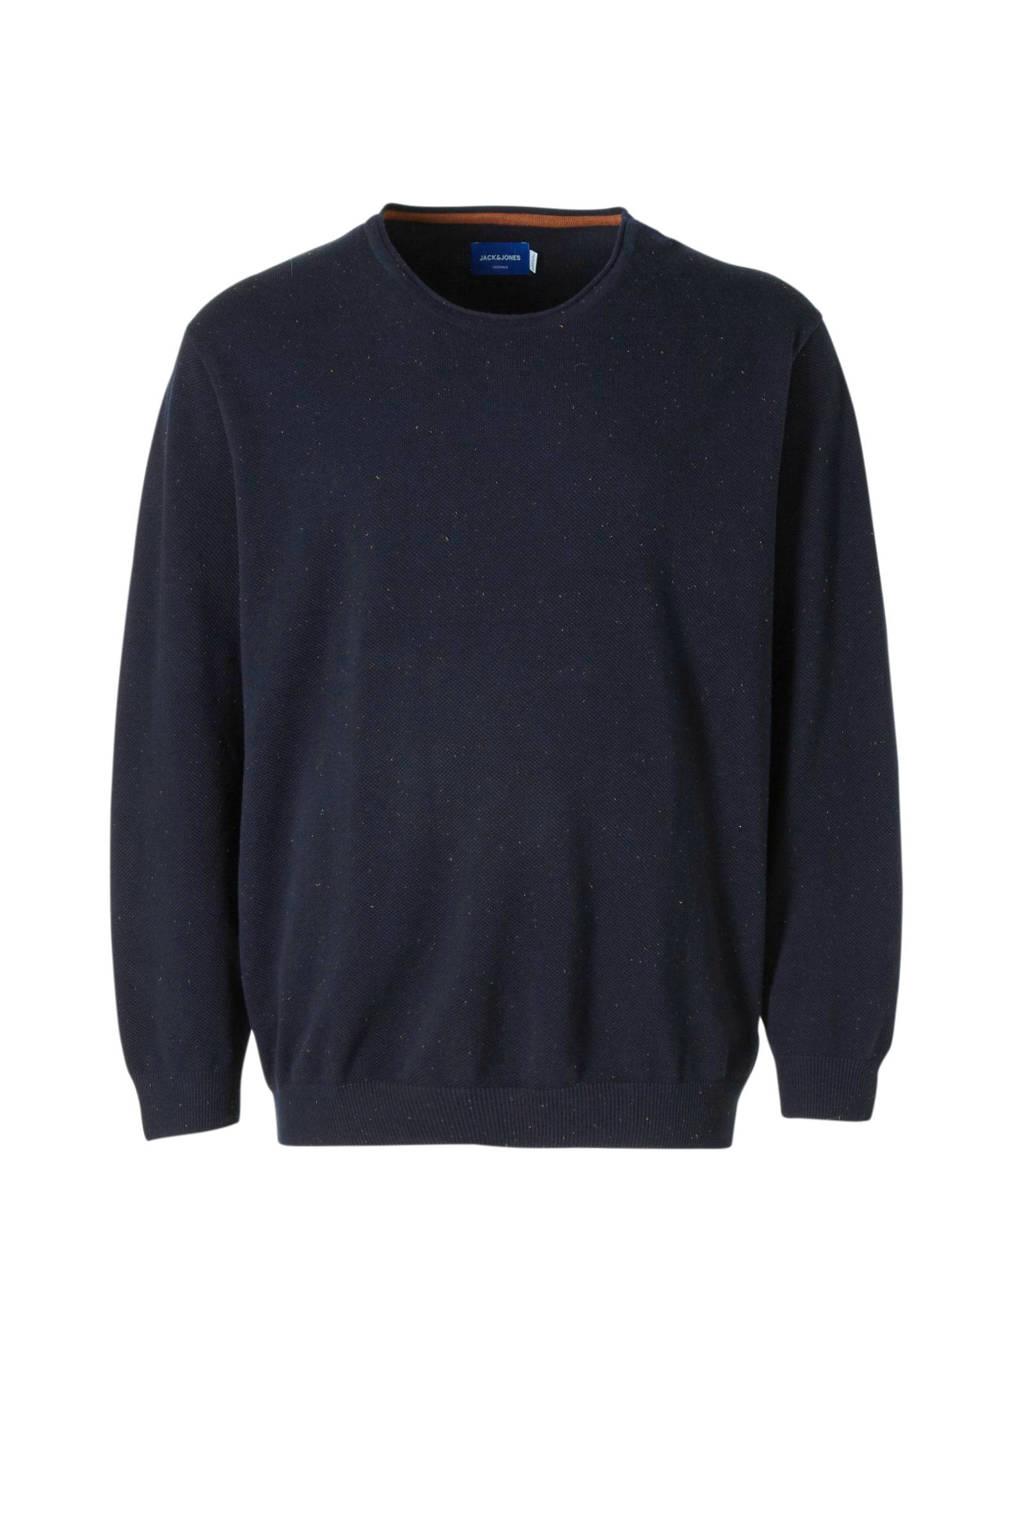 JACK & JONES PLUS SIZE trui donkerblauw, Donkerblauw